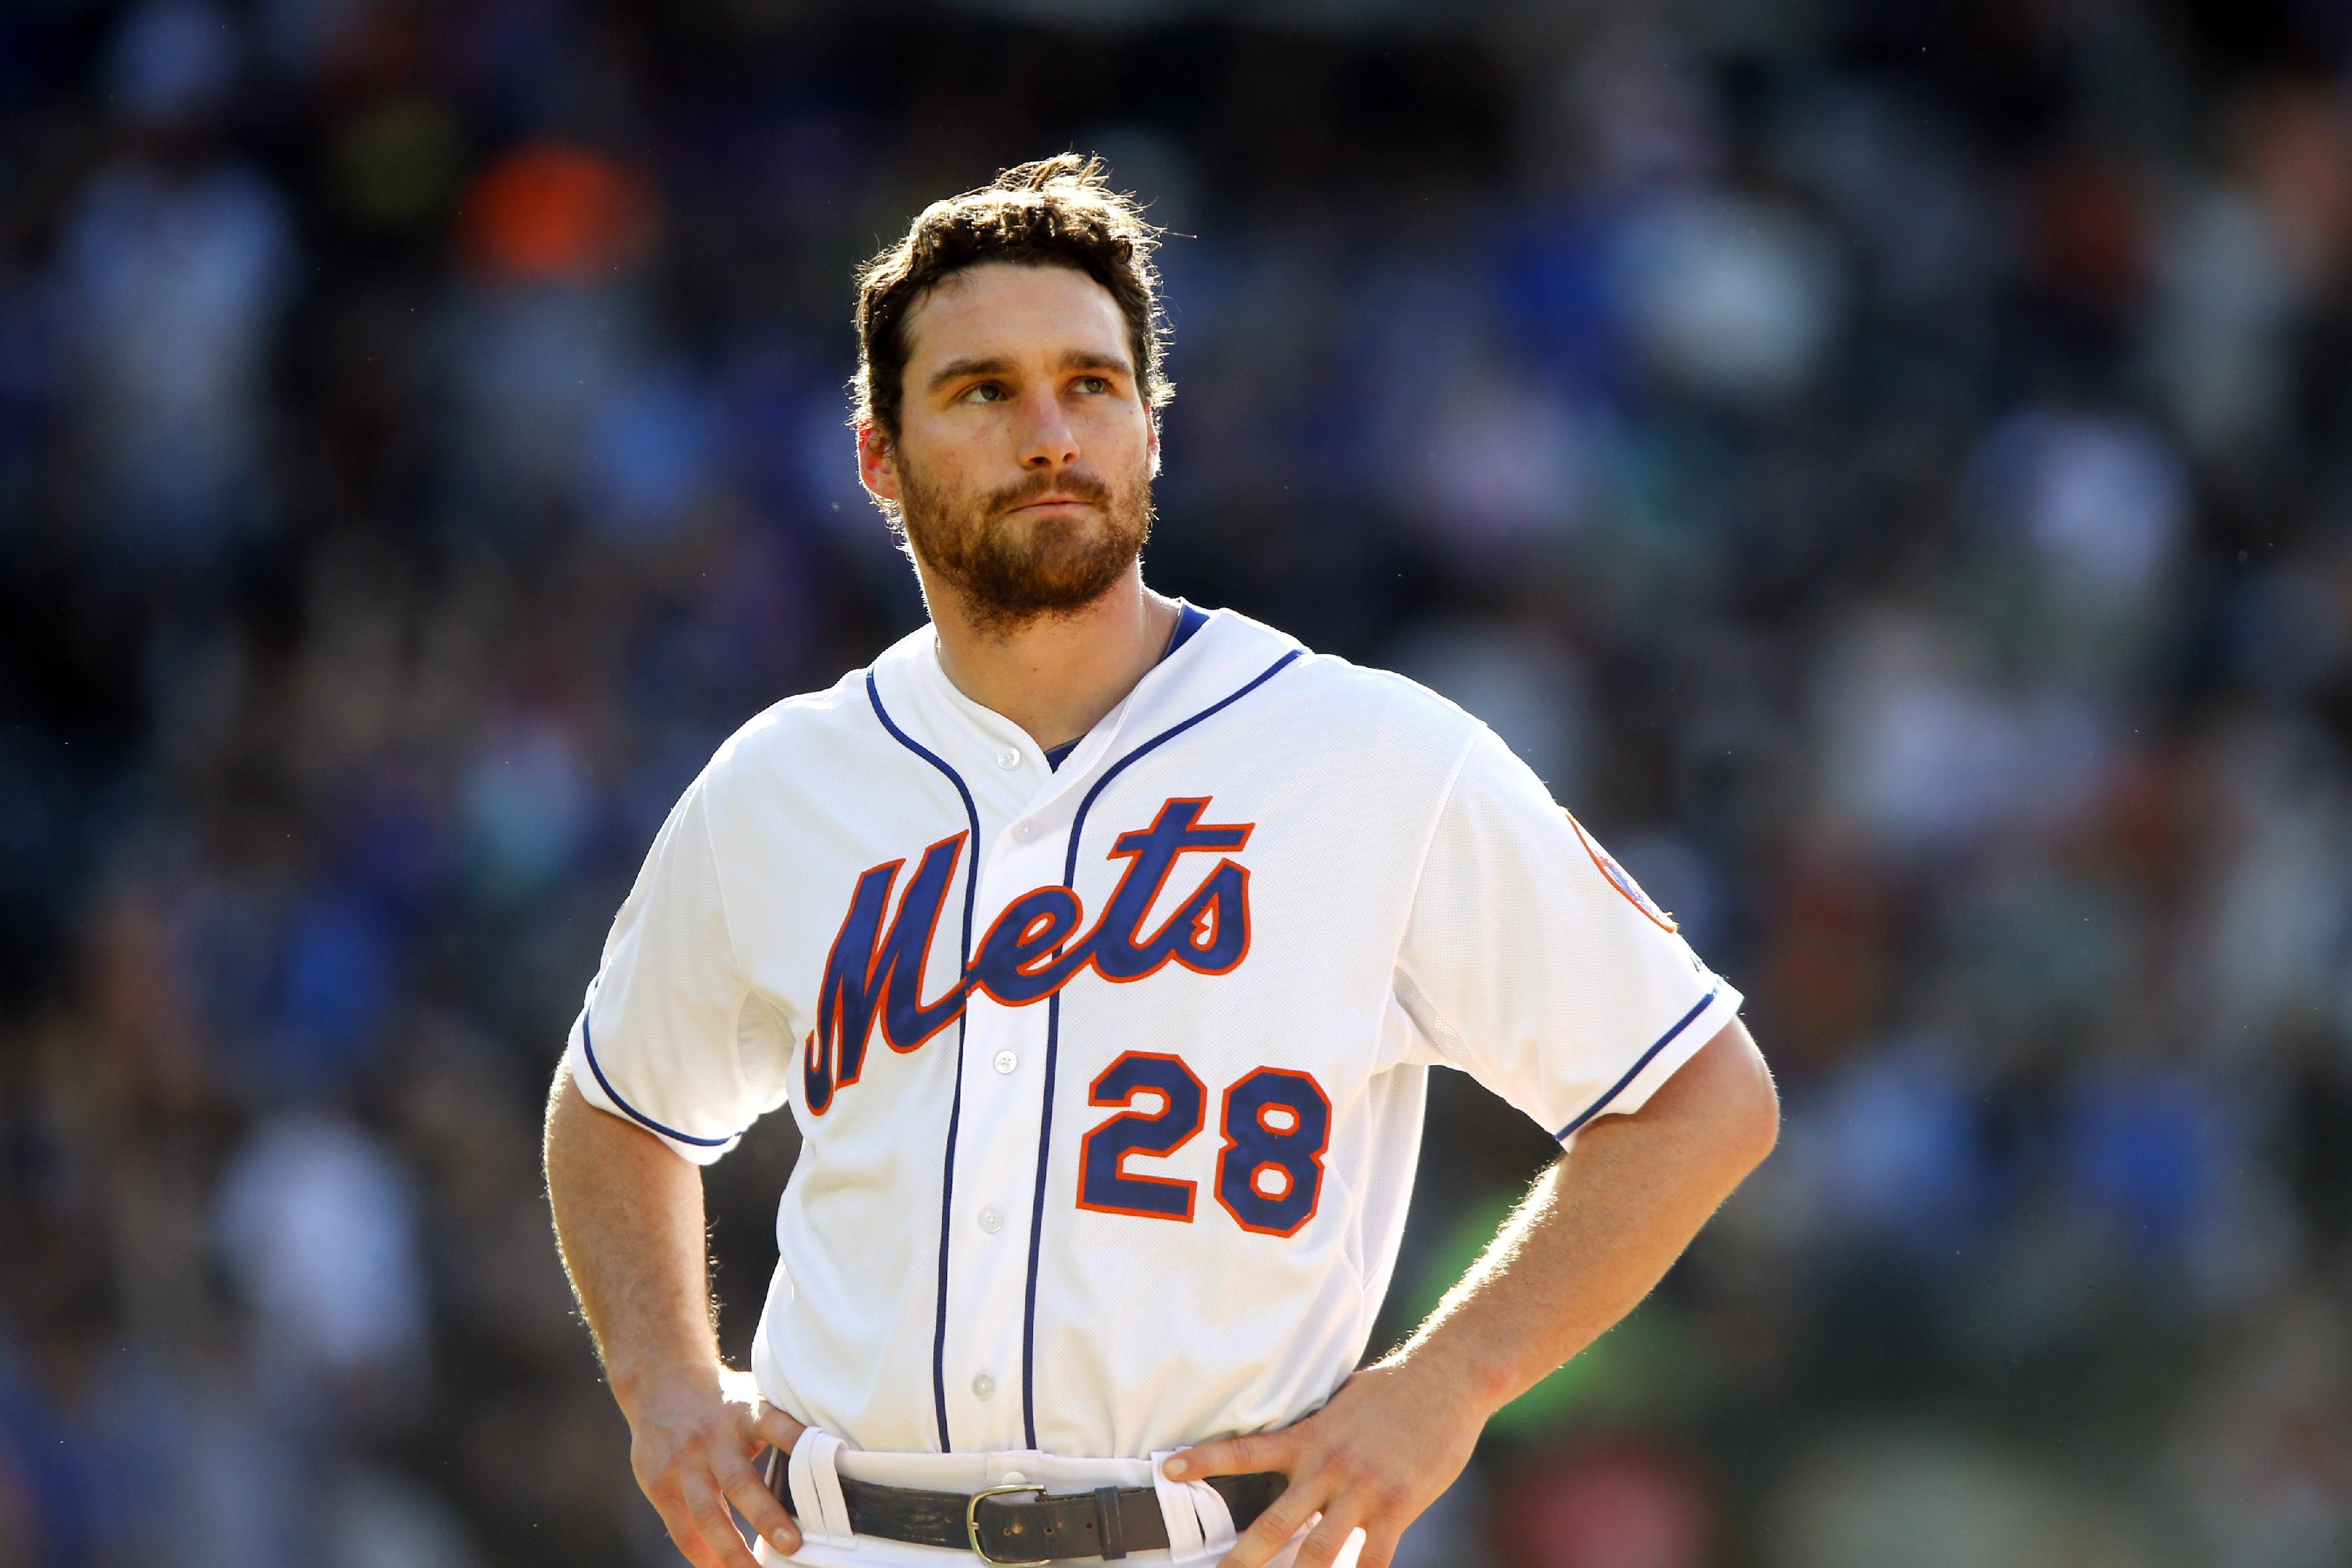 Hahn gets 1st W, Padres stop 5-game skid, top Mets